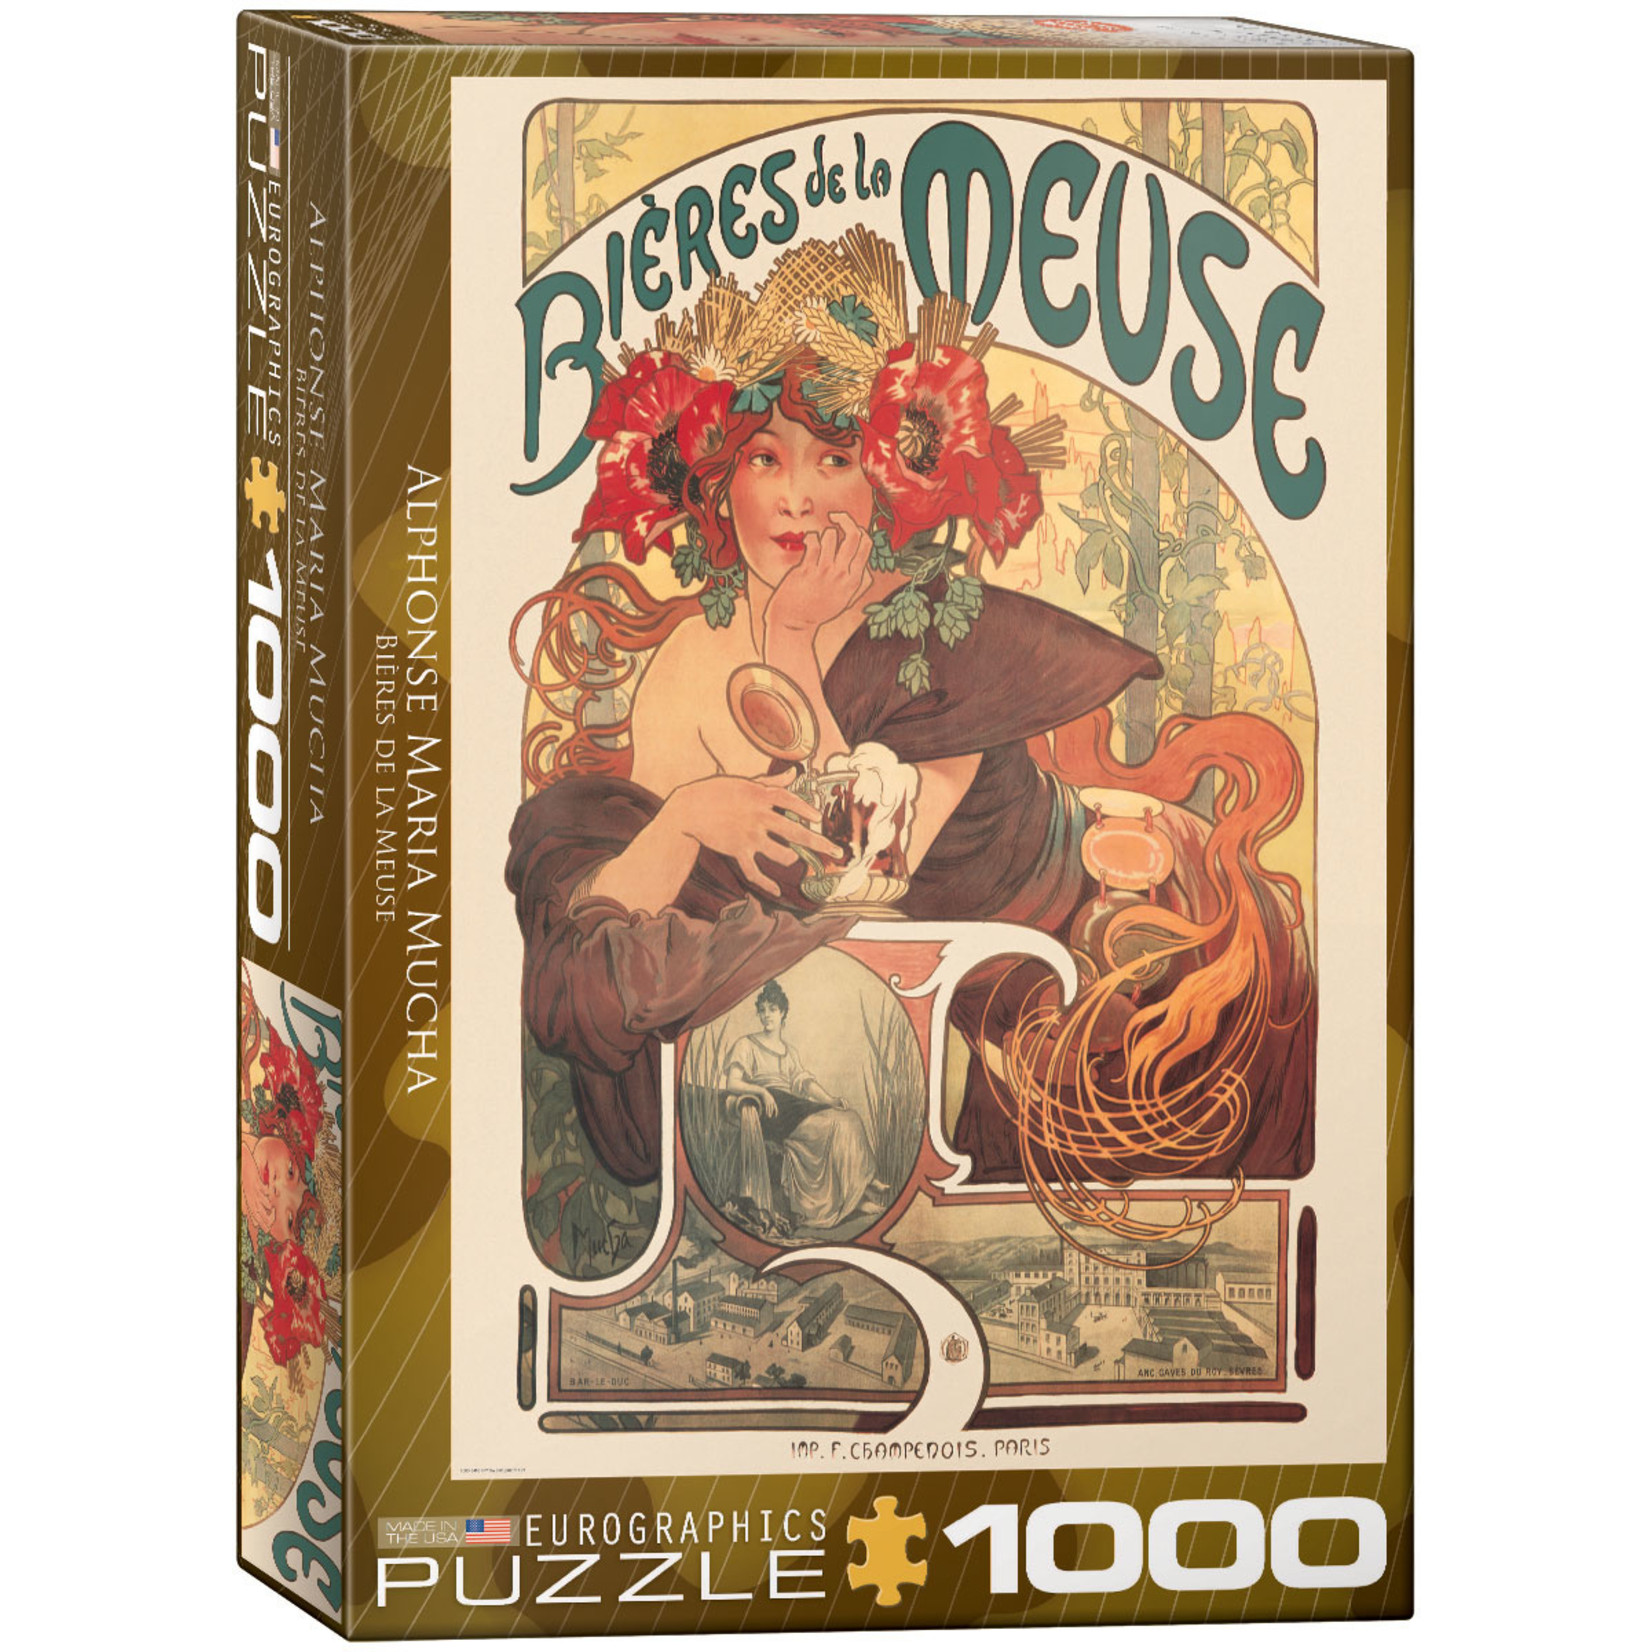 EuroGraphics Puzzles Bieres de la Meuse - Mucha 1000pc